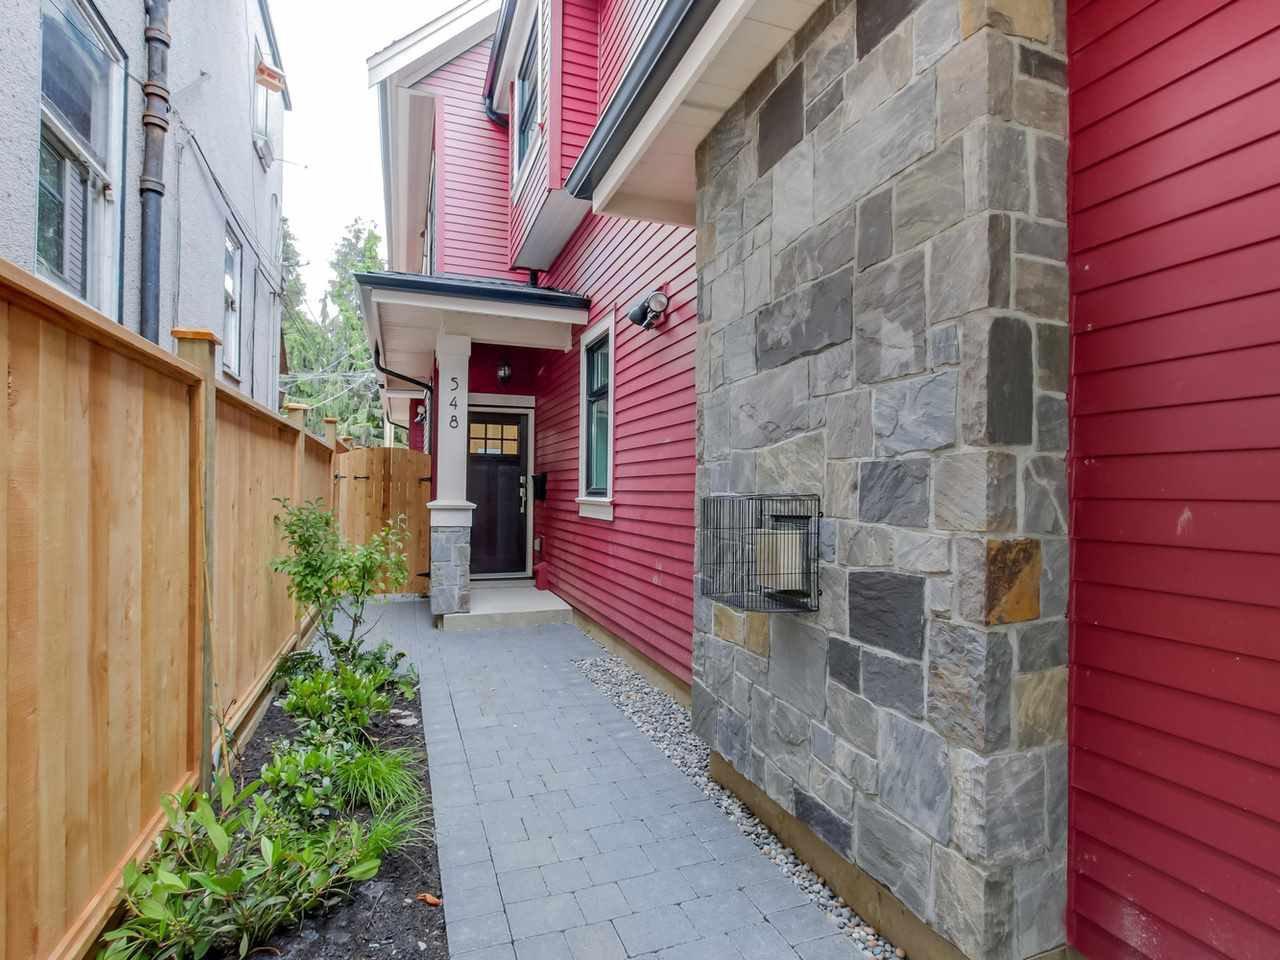 Main Photo: 548 E 10TH Avenue in Vancouver: Mount Pleasant VE House 1/2 Duplex for sale (Vancouver East)  : MLS®# R2085035